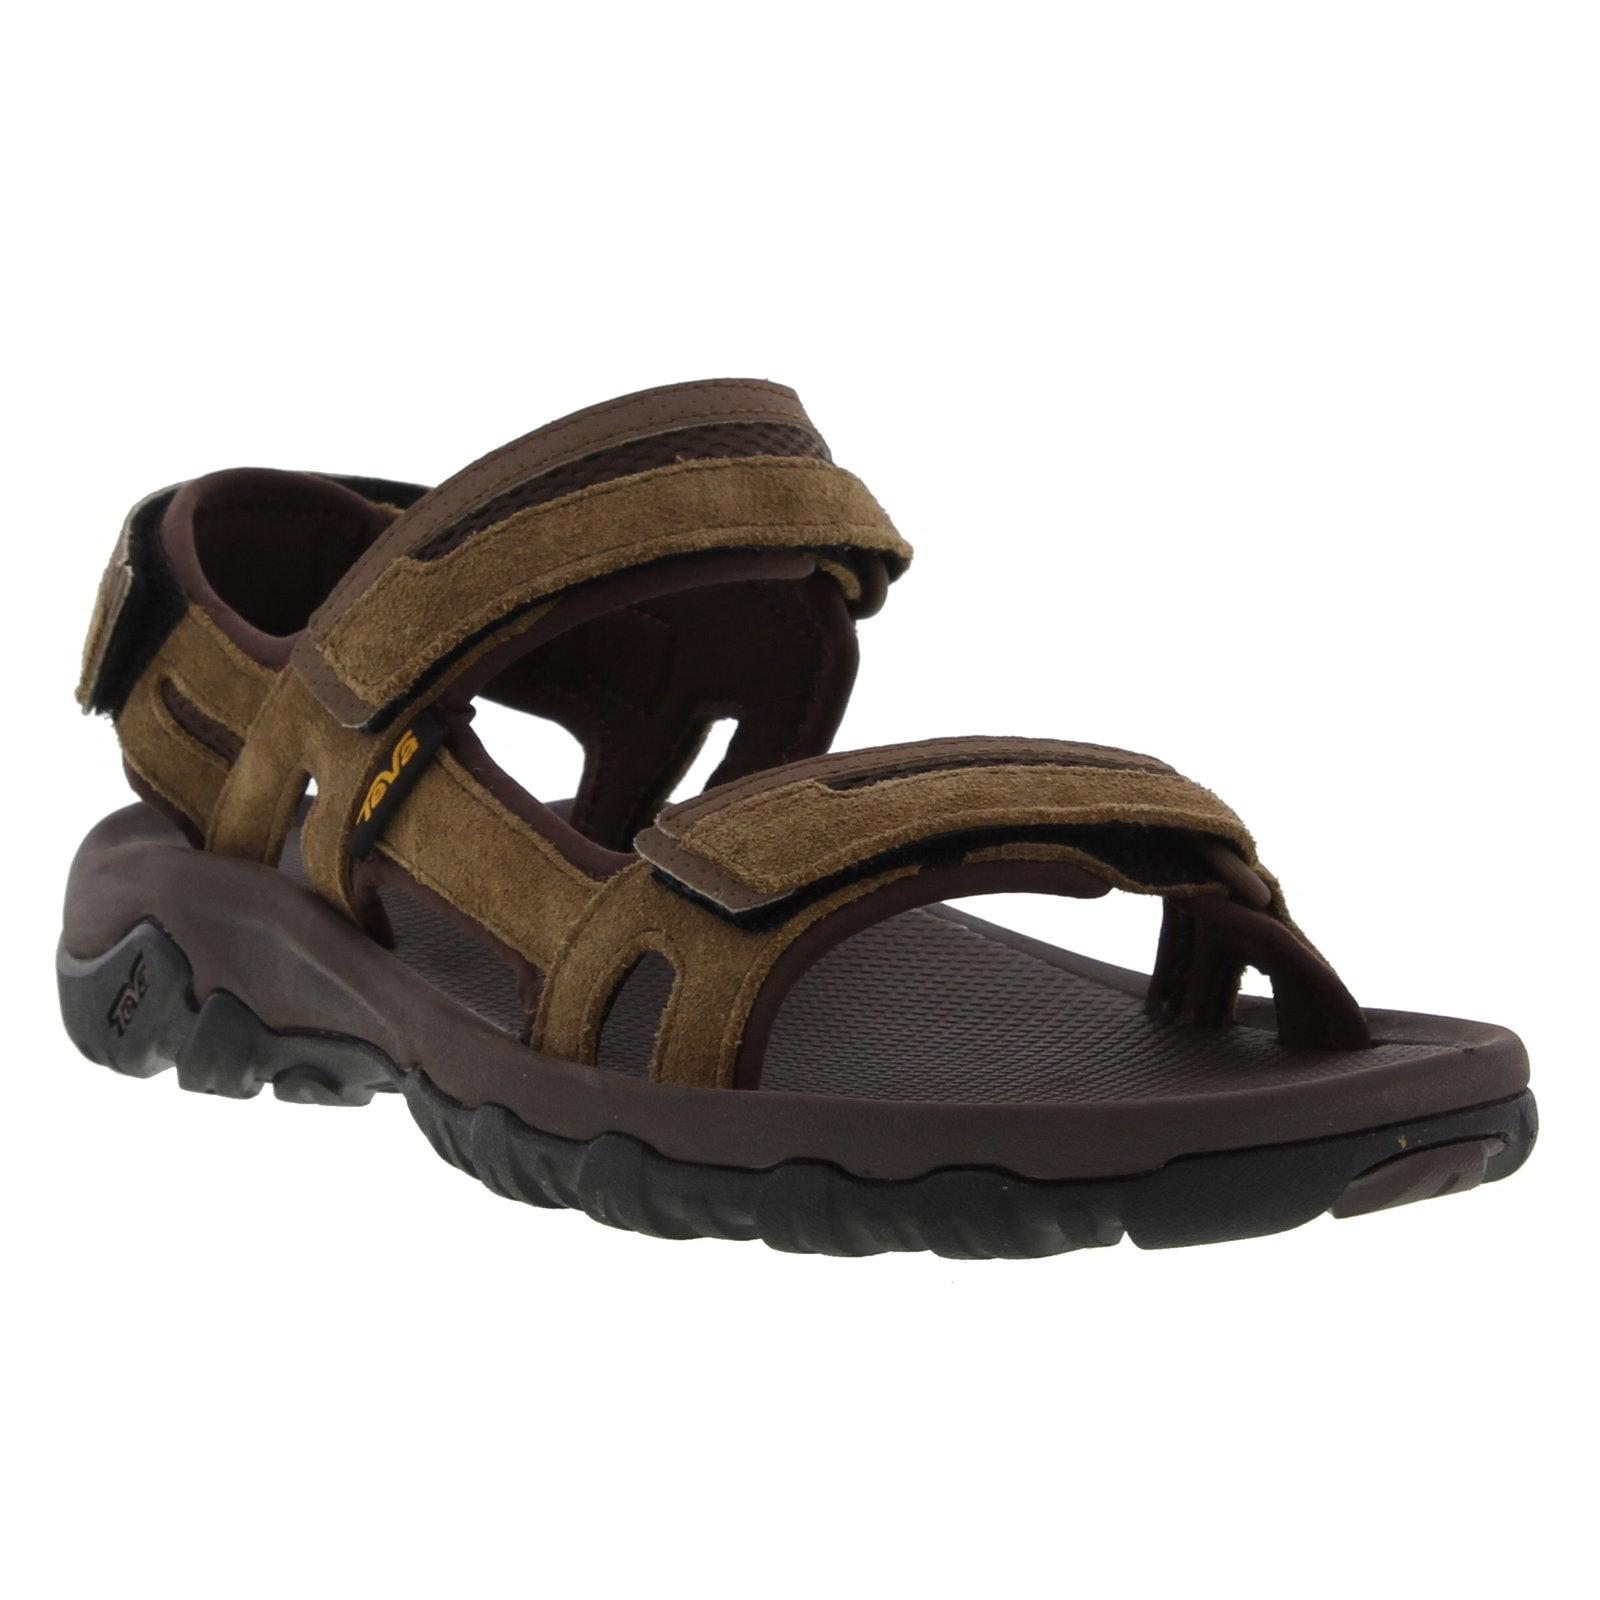 Teva Hudson Mens Adjustable Comfortable Walking Hiking